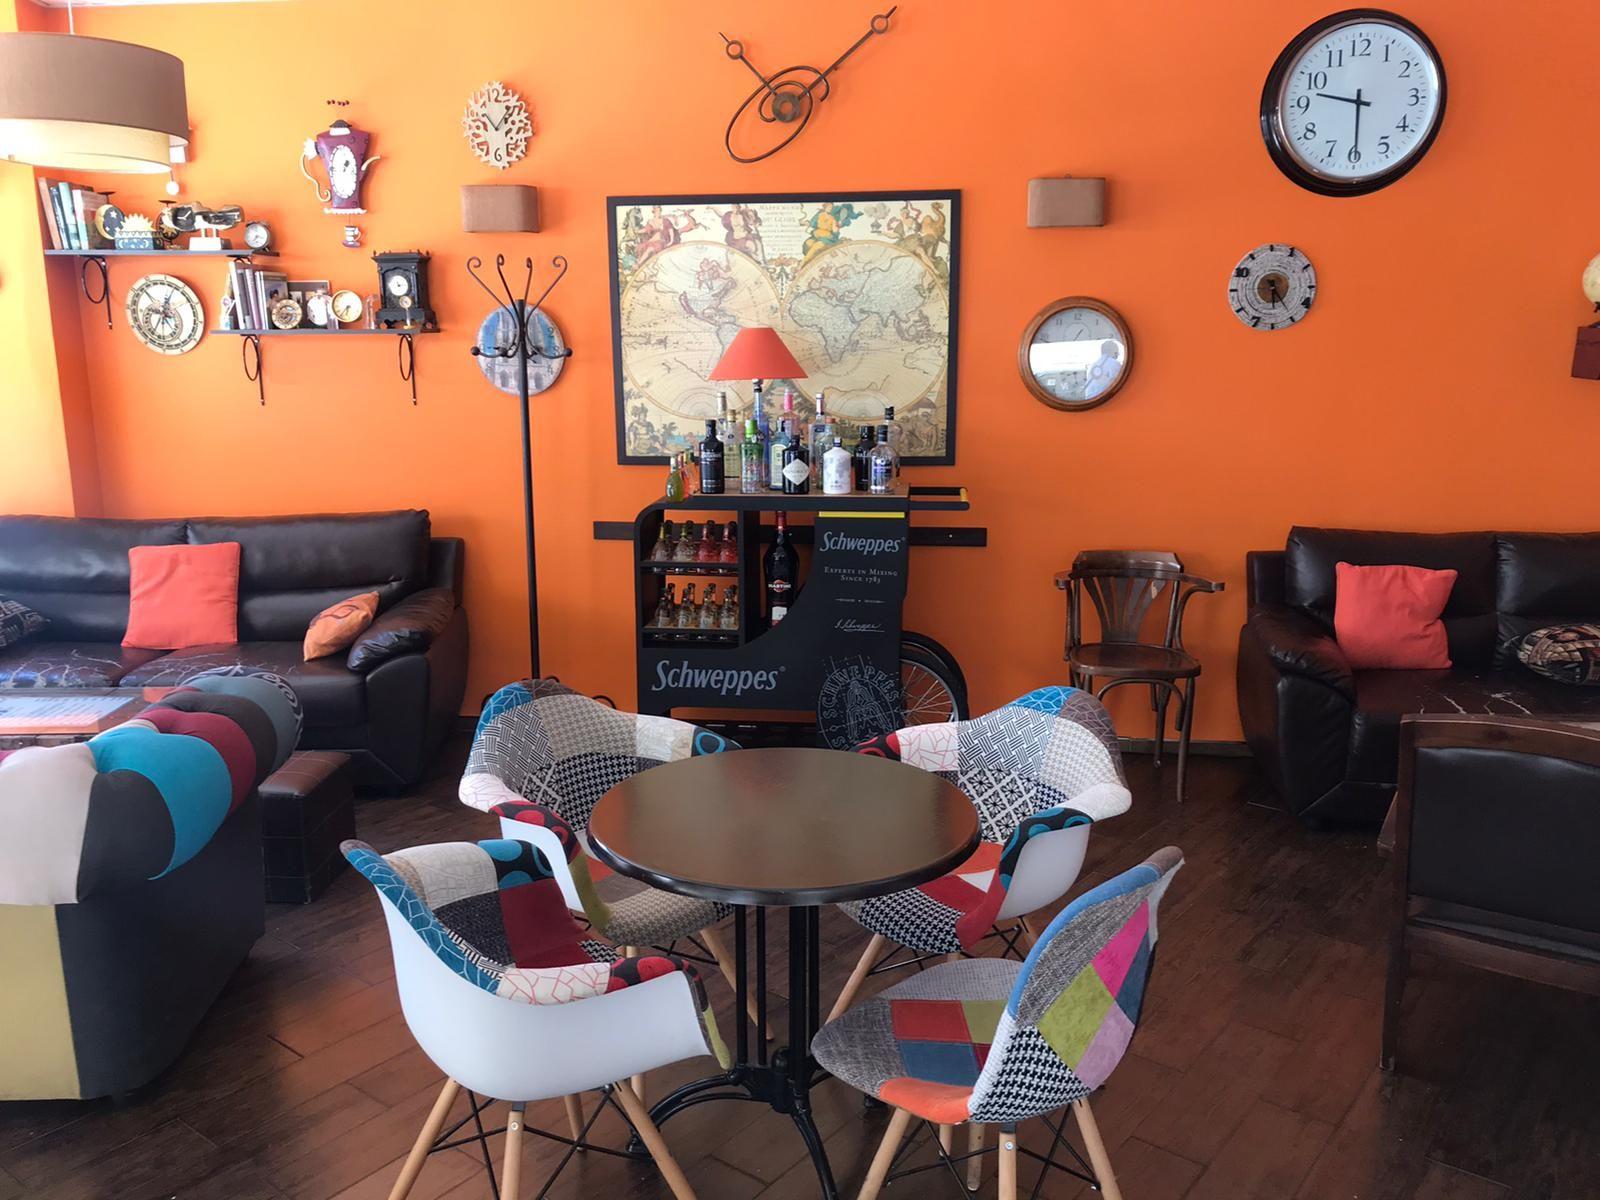 Foto 7 de Restaurante en Valencia | Cafetería Tosteria O´Clock